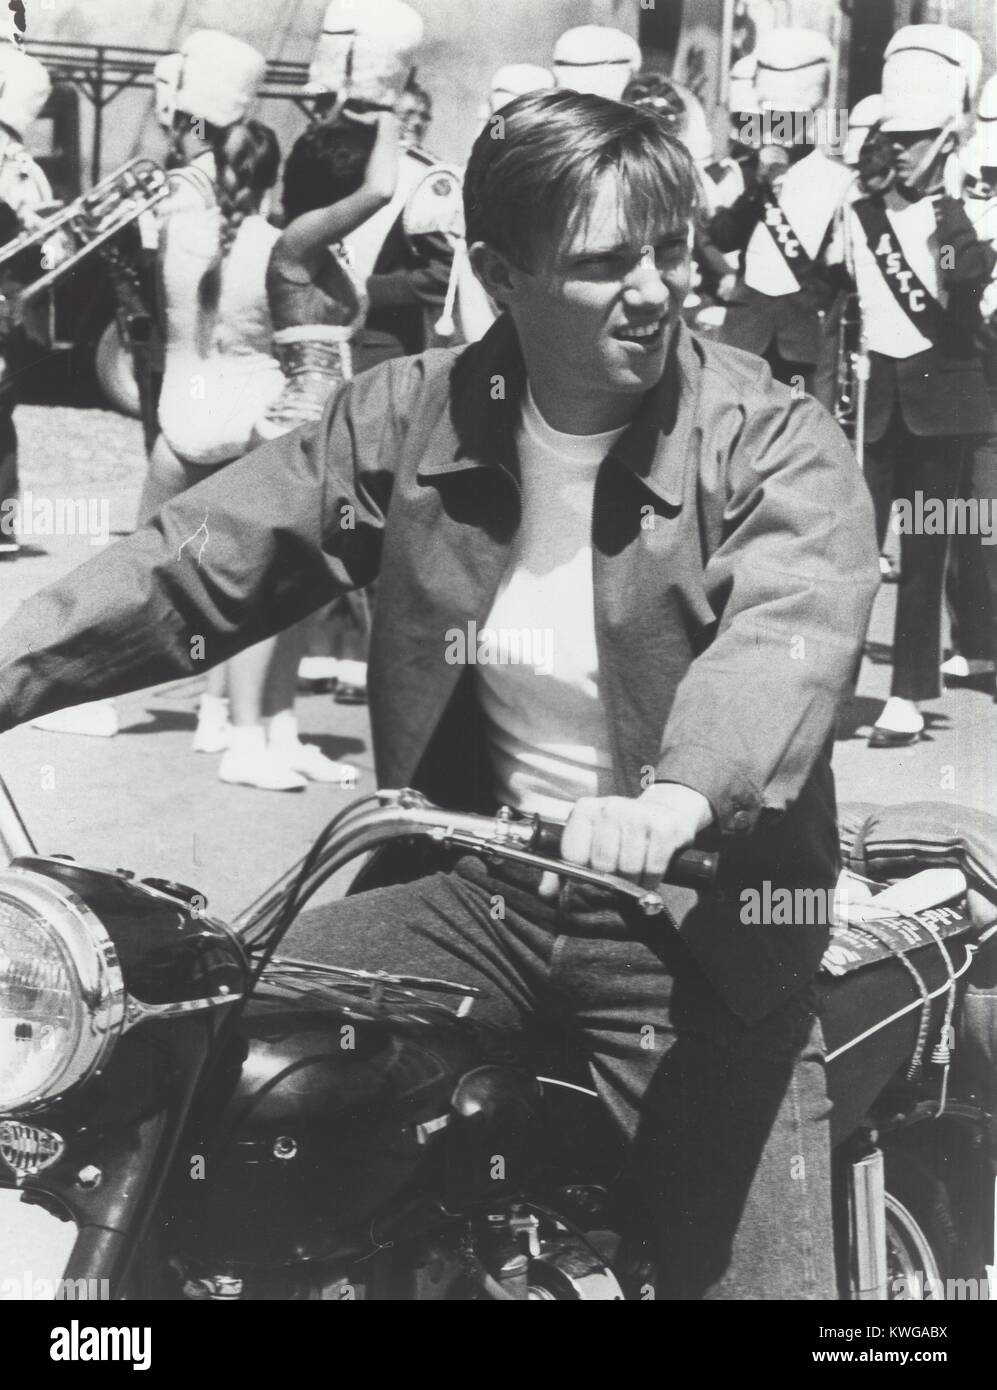 1978 - RICHARD THOMAS The Day James Dean Died aka September